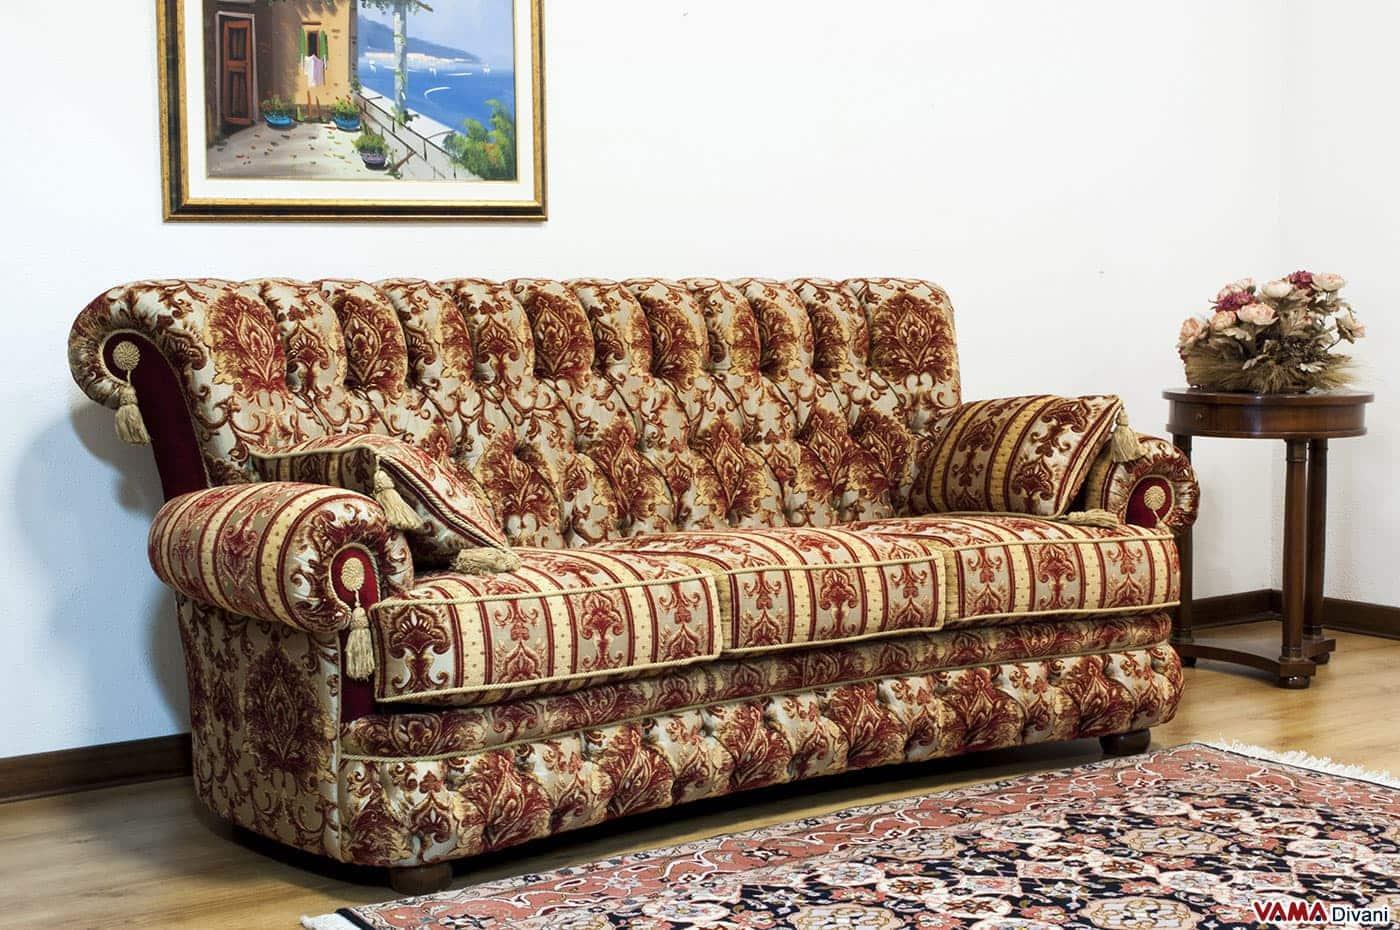 vama-divani-su-misura-catalogo-15